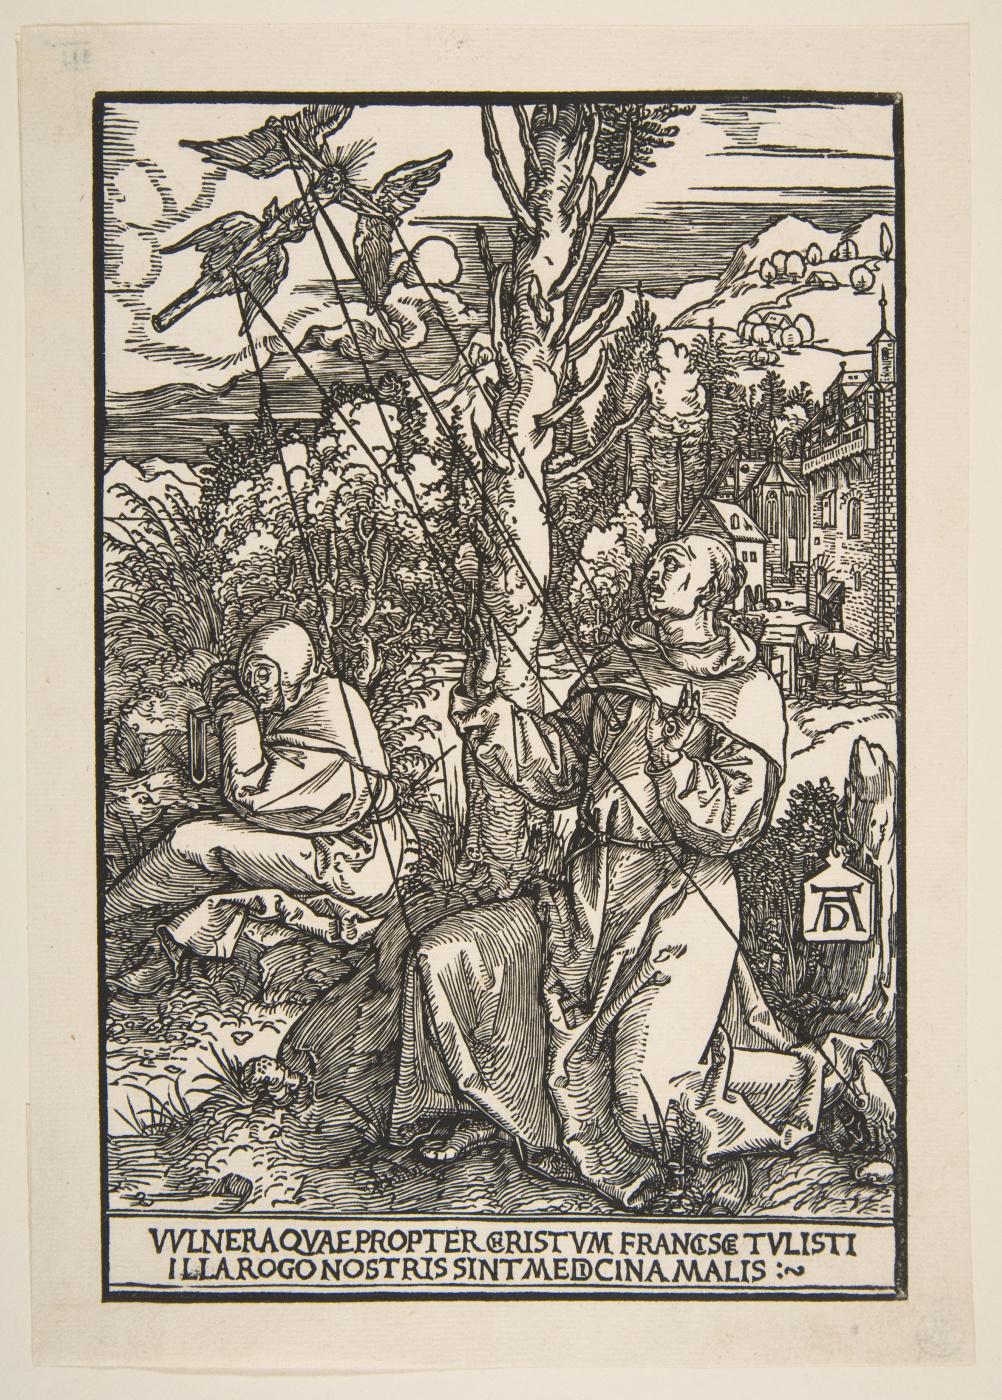 Albrecht Dürer. St. Francis receiving the stigmata